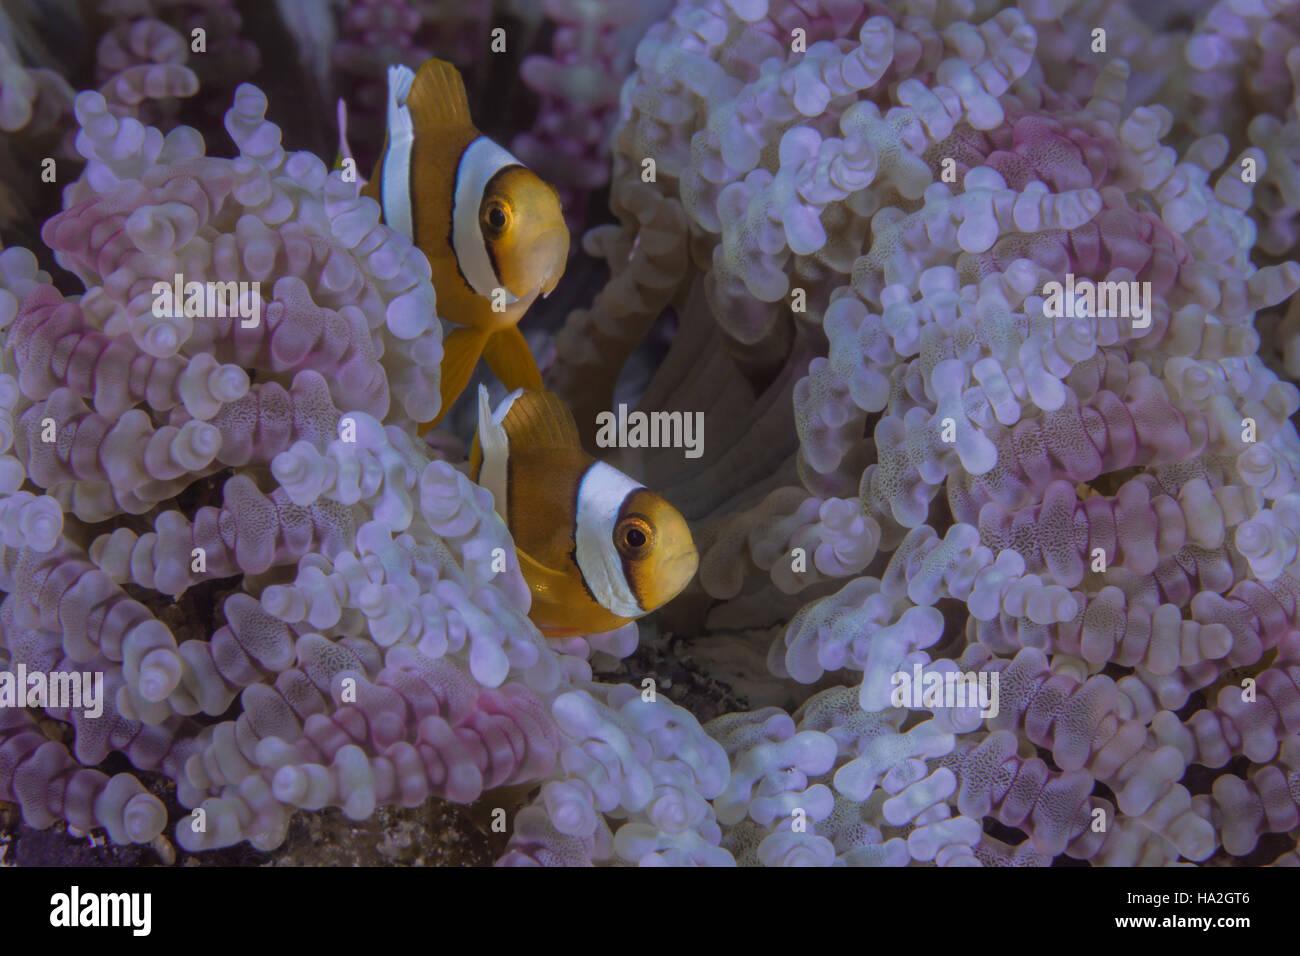 Orange clownfish peer from purple beaded tentacles of carpet anemone - Stock Image